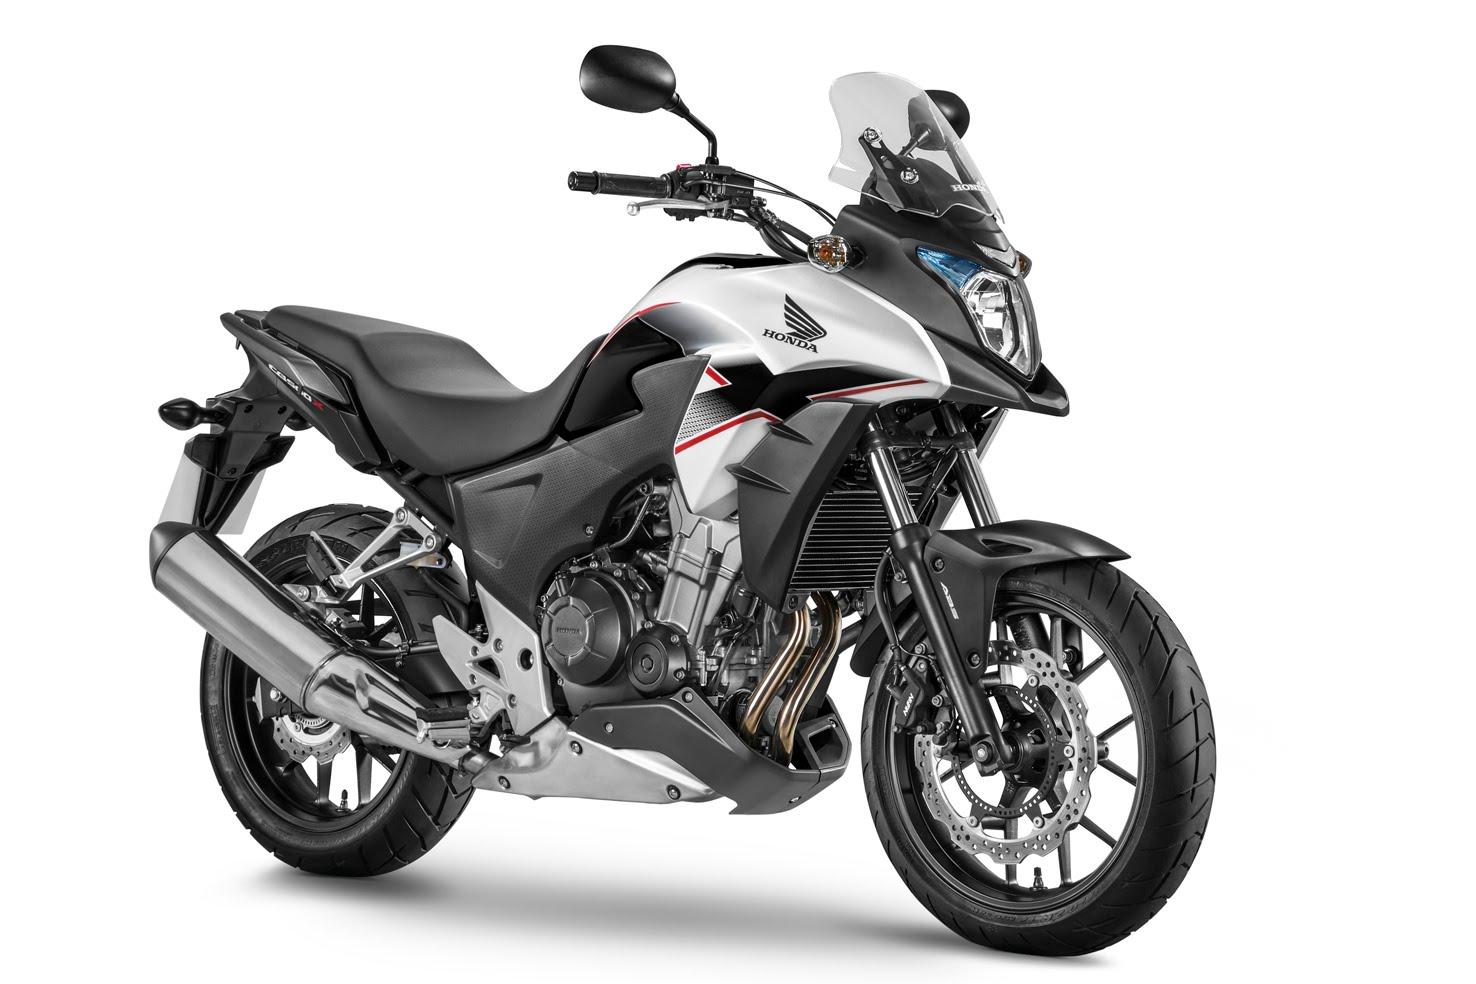 Ficha tcnica da Honda CB 500 X 2014 a 2020